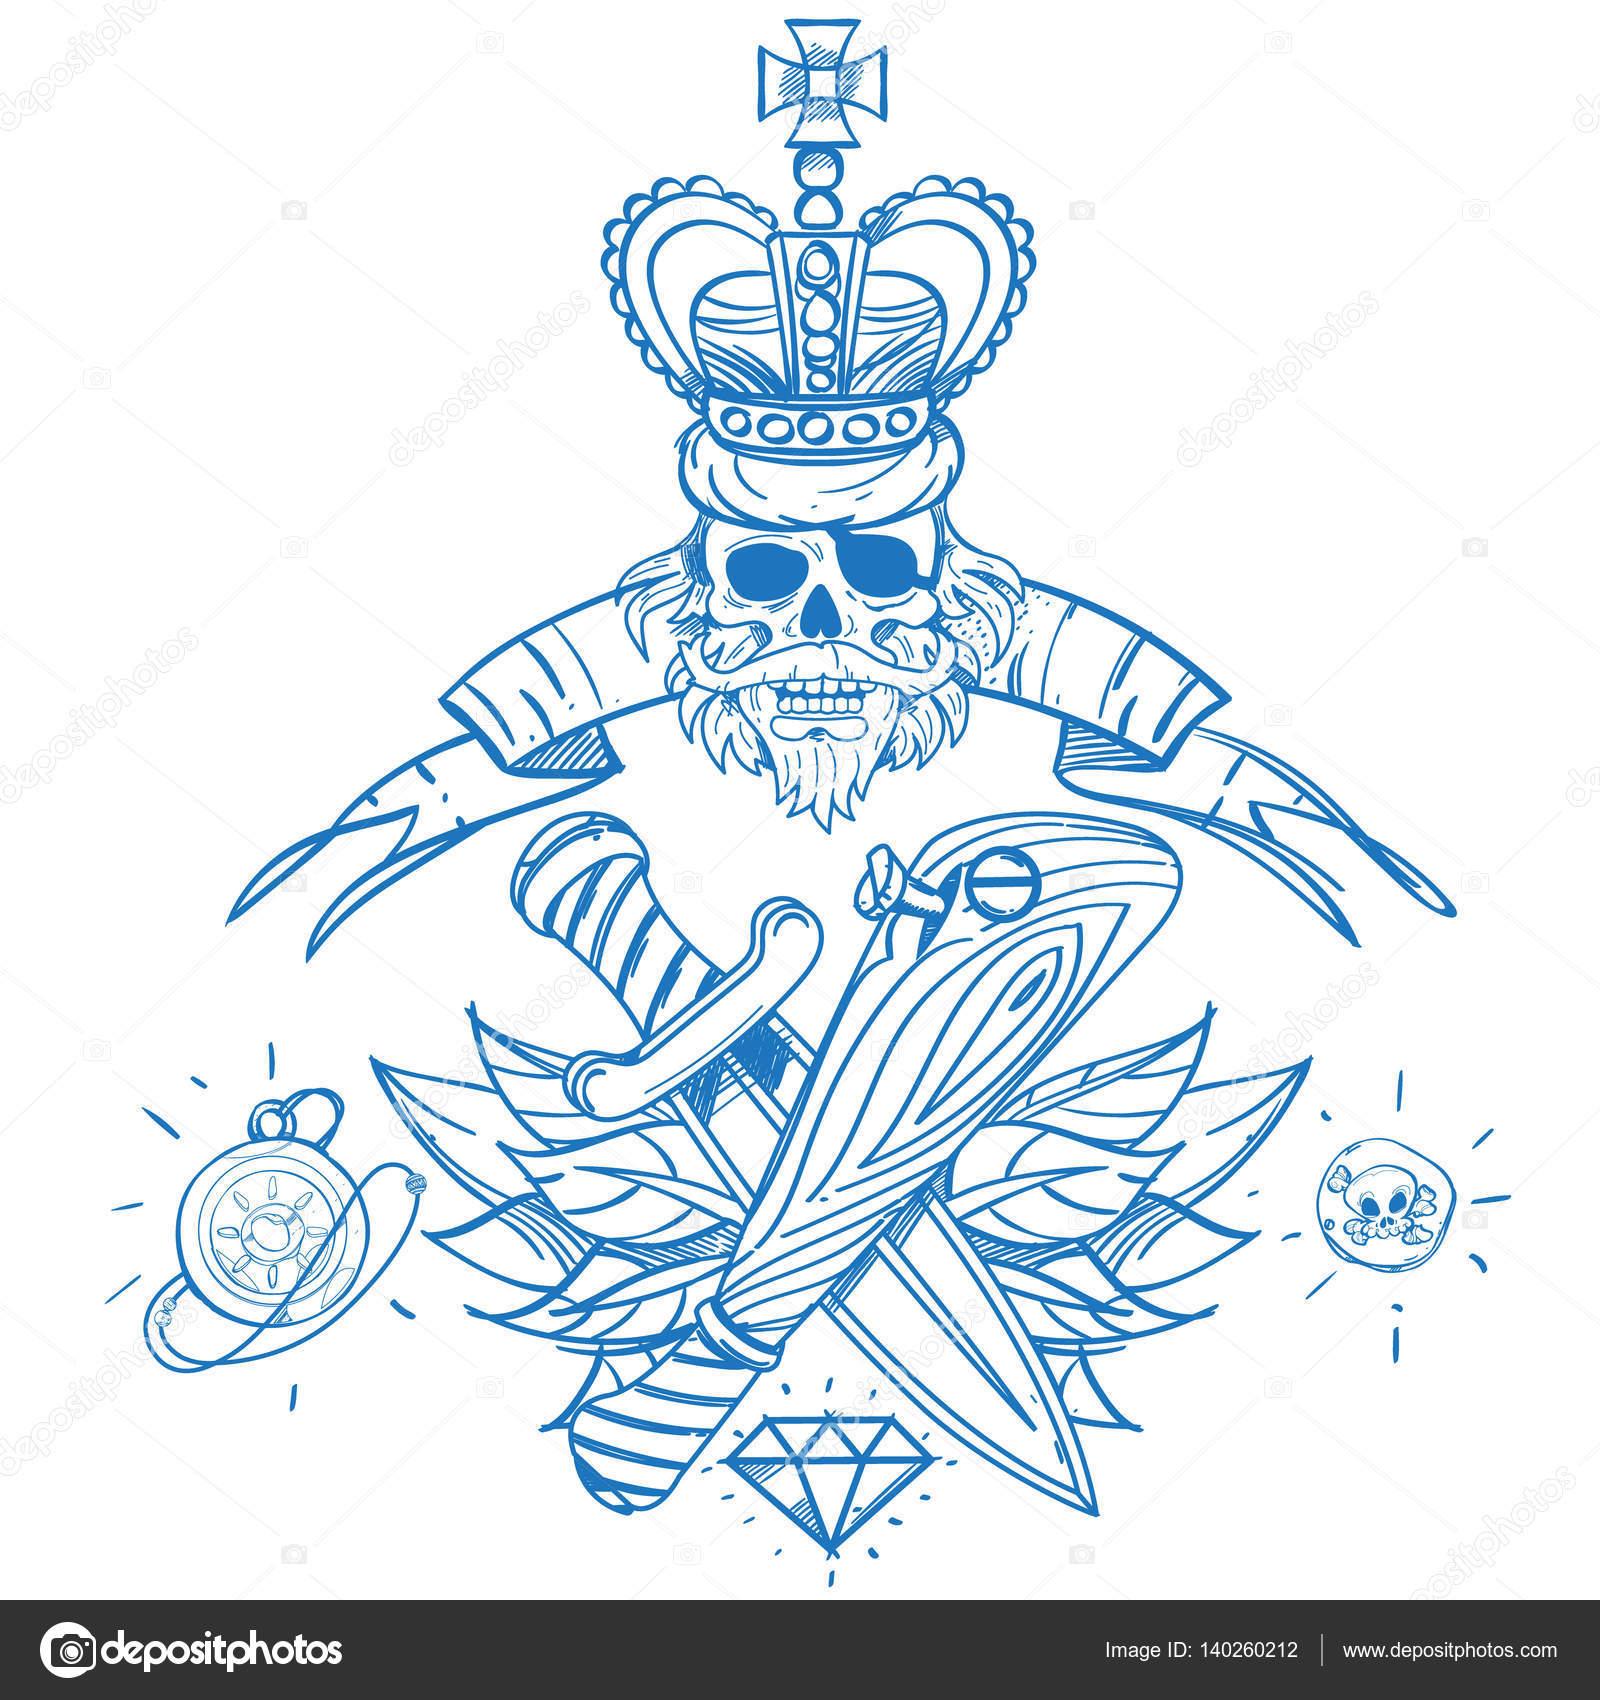 Fotos Tatuajes De Pelotas De Beisbol Tatuaje Con Bate De Béisbol